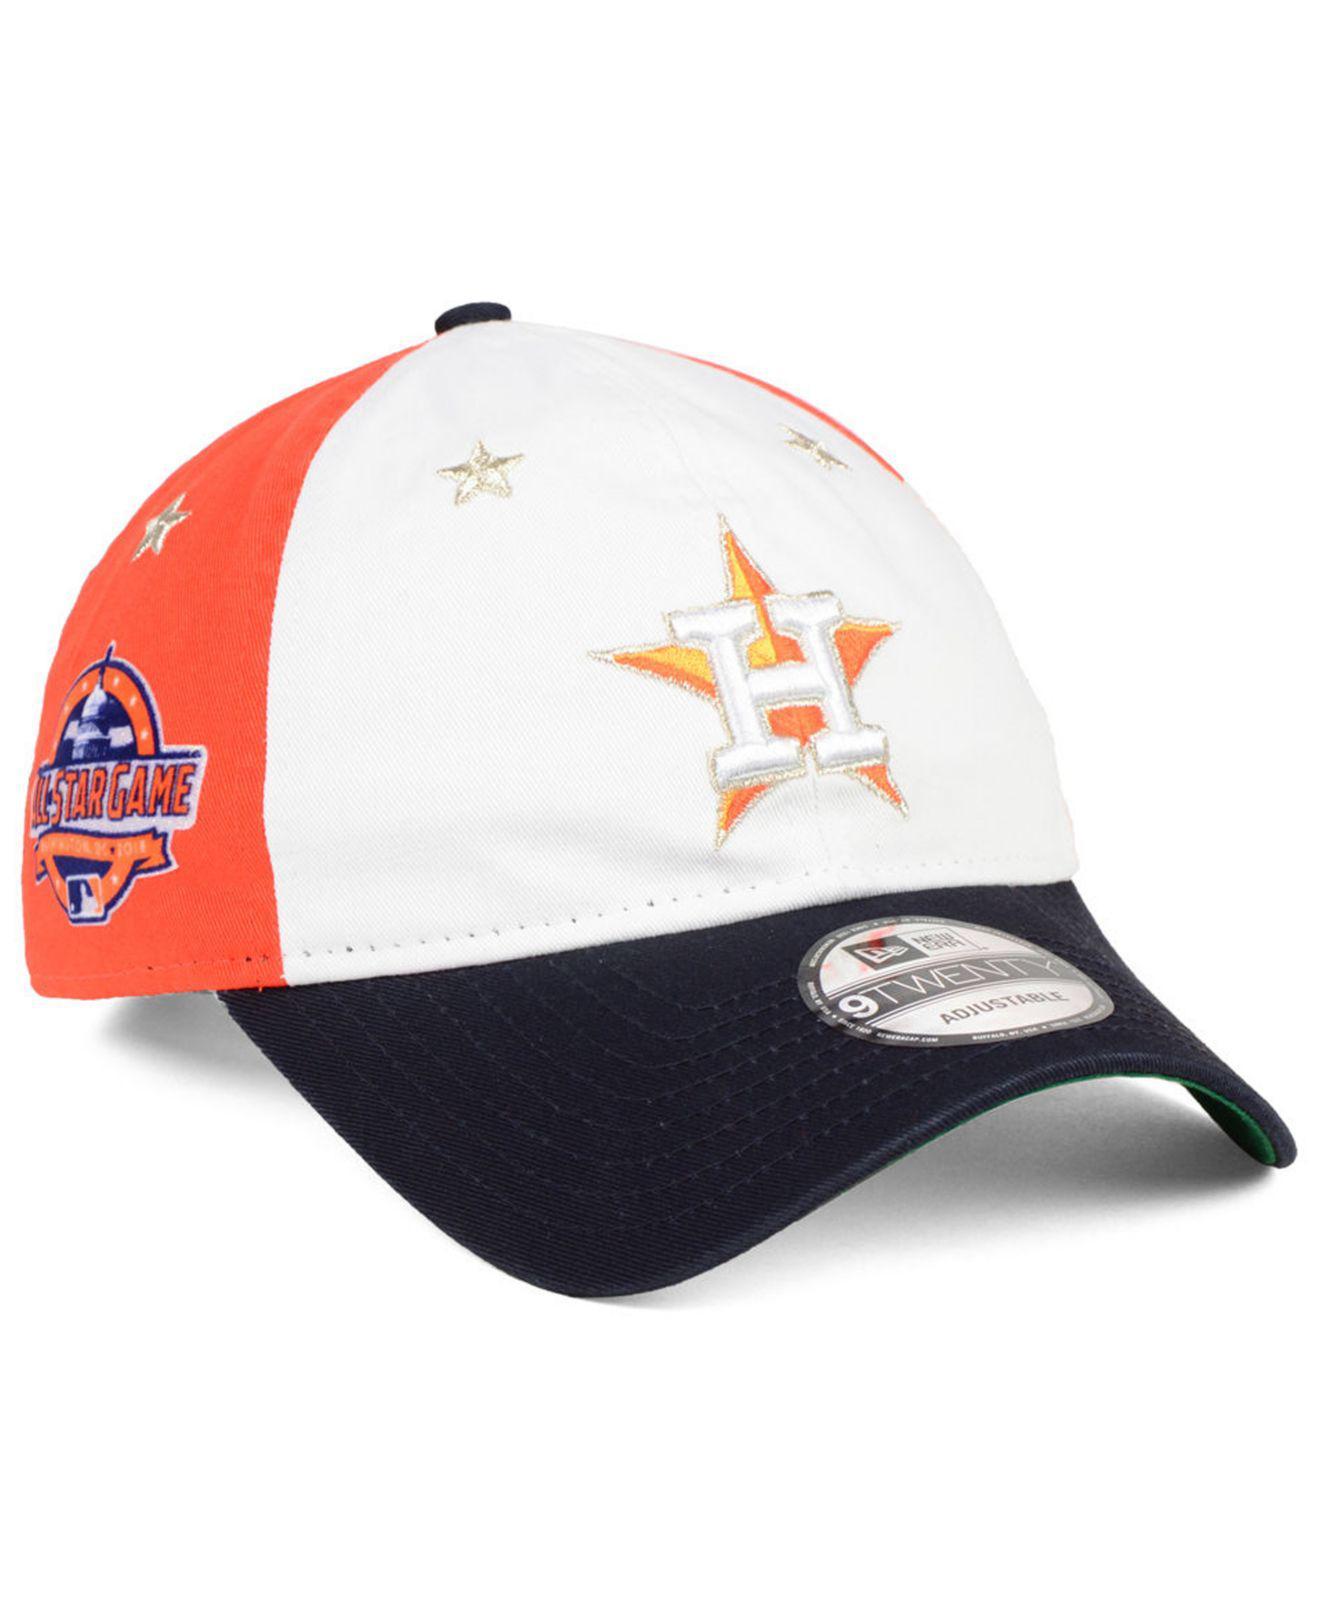 new arrival a4441 a3682 KTZ Houston Astros All Star Game 9twenty Strapback Cap 2018 in Blue ...